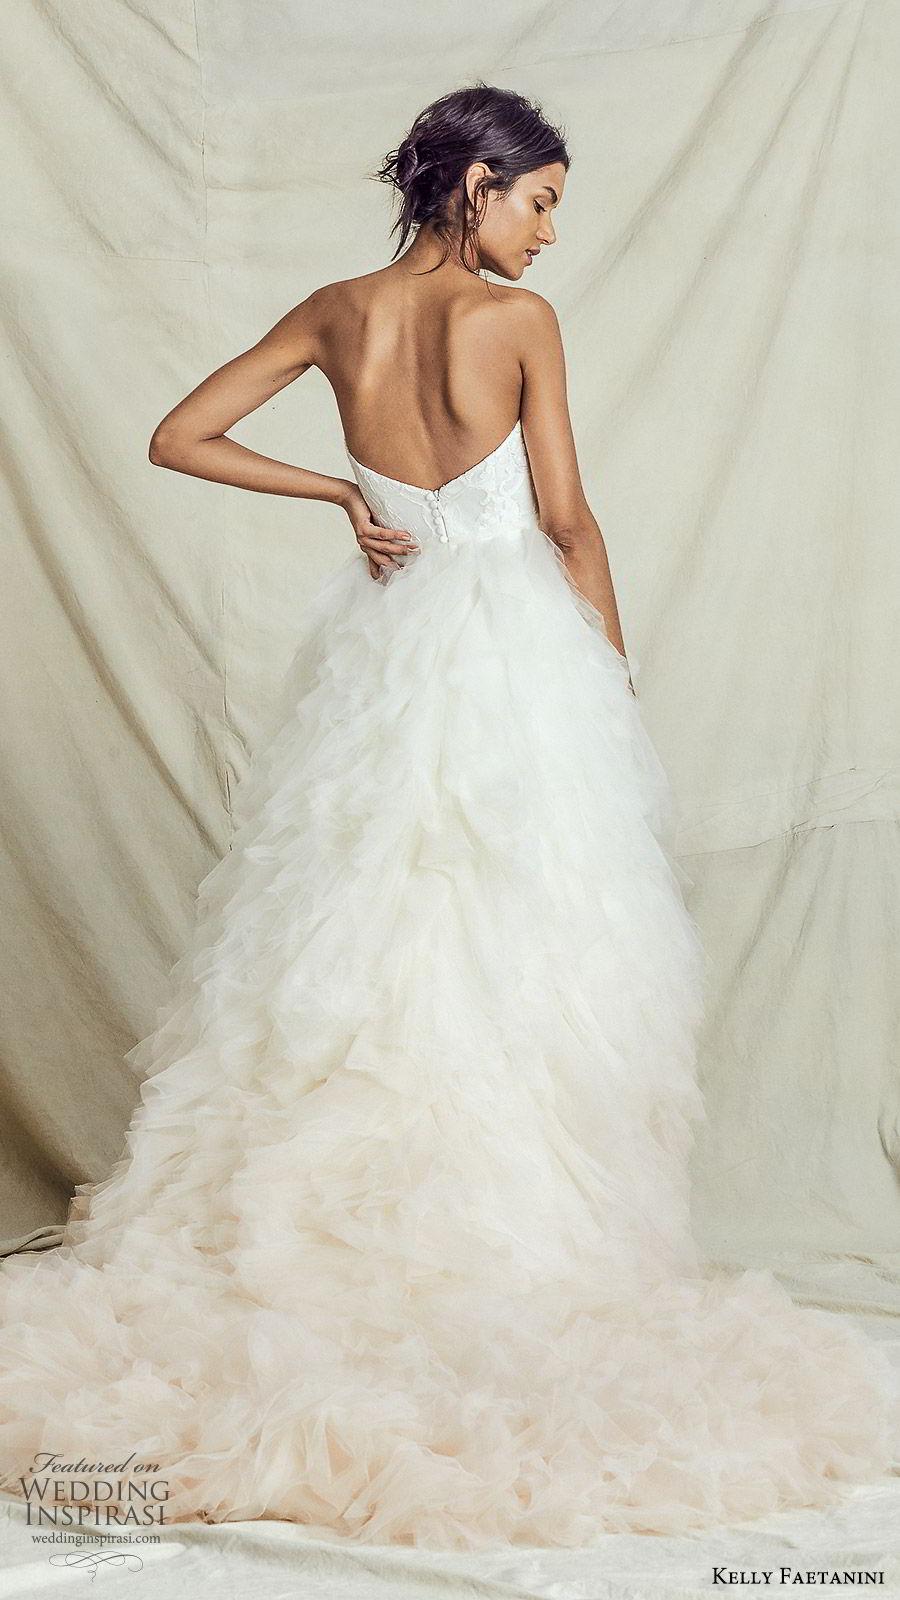 kelly faetanini fall 2019 bridal strapless sweetheart lace bodice a line ball gown wedding dress ruffle skirt ombre blush romantic elegant (7) bv